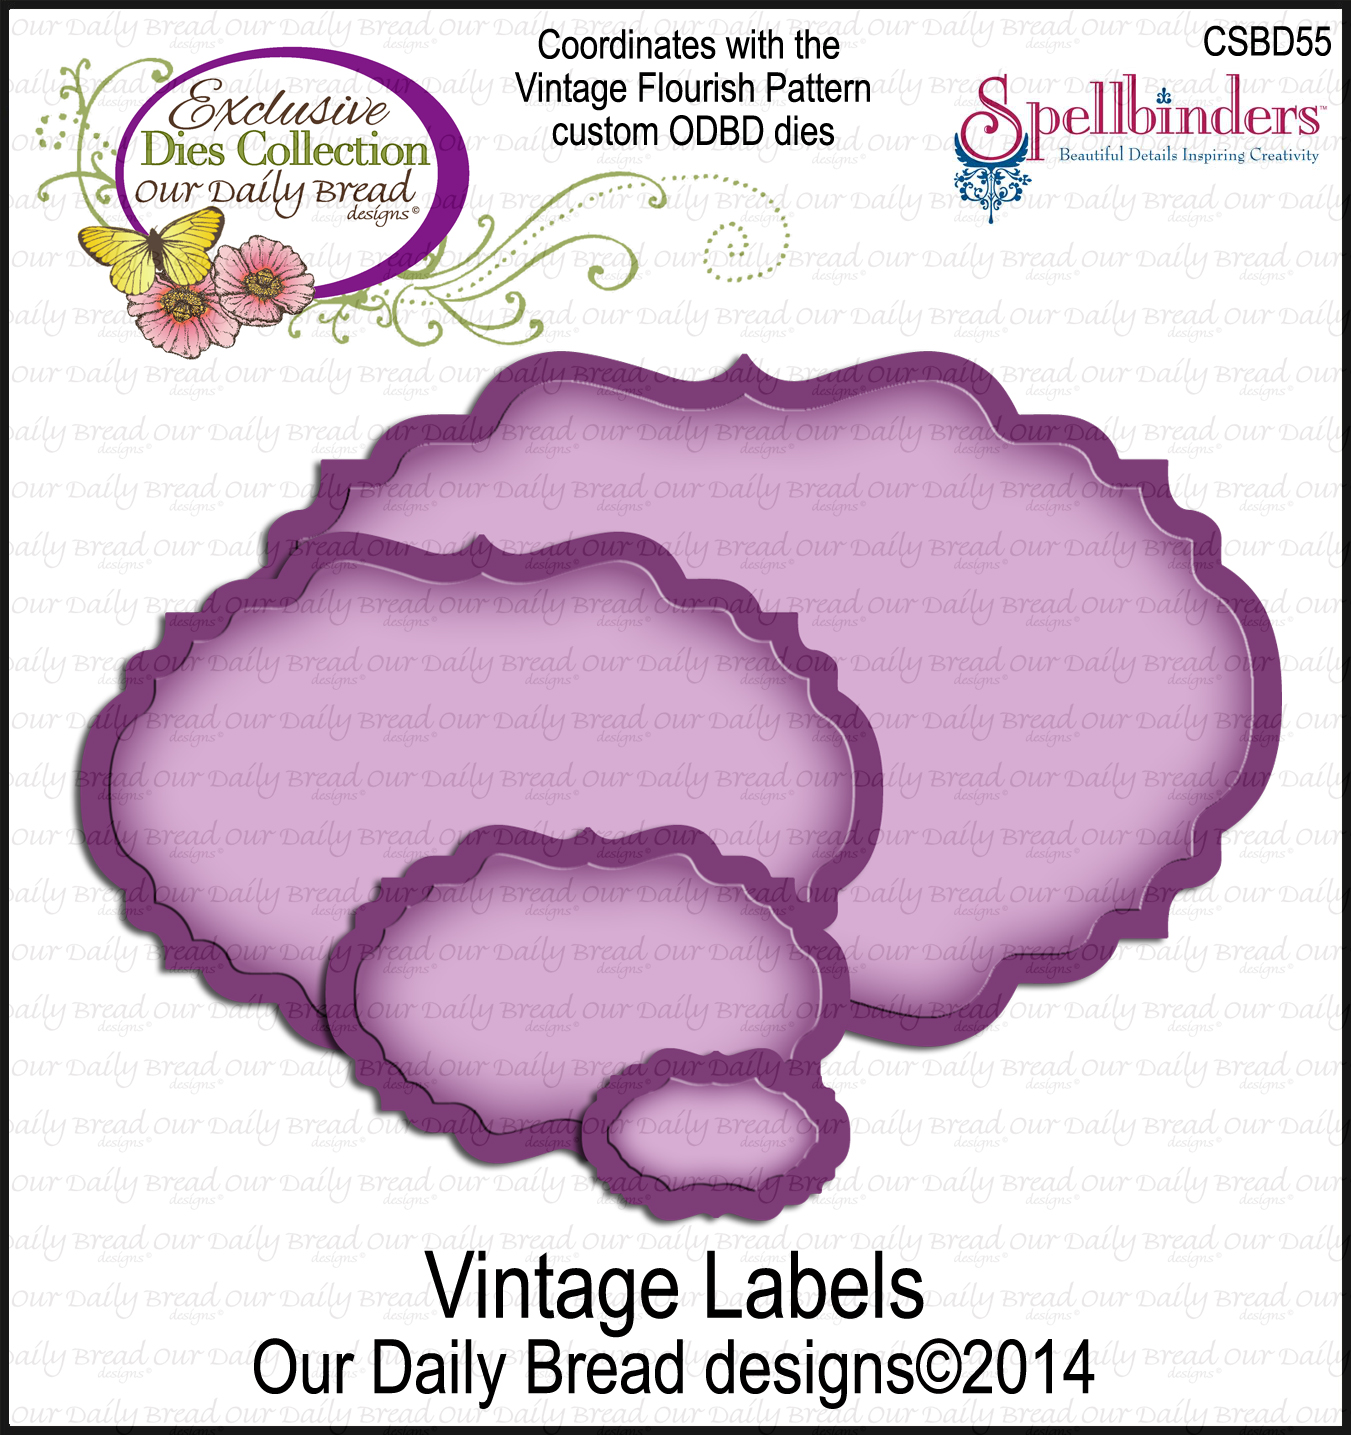 https://www.ourdailybreaddesigns.com/index.php/csbd55-vintage-label-dies.html